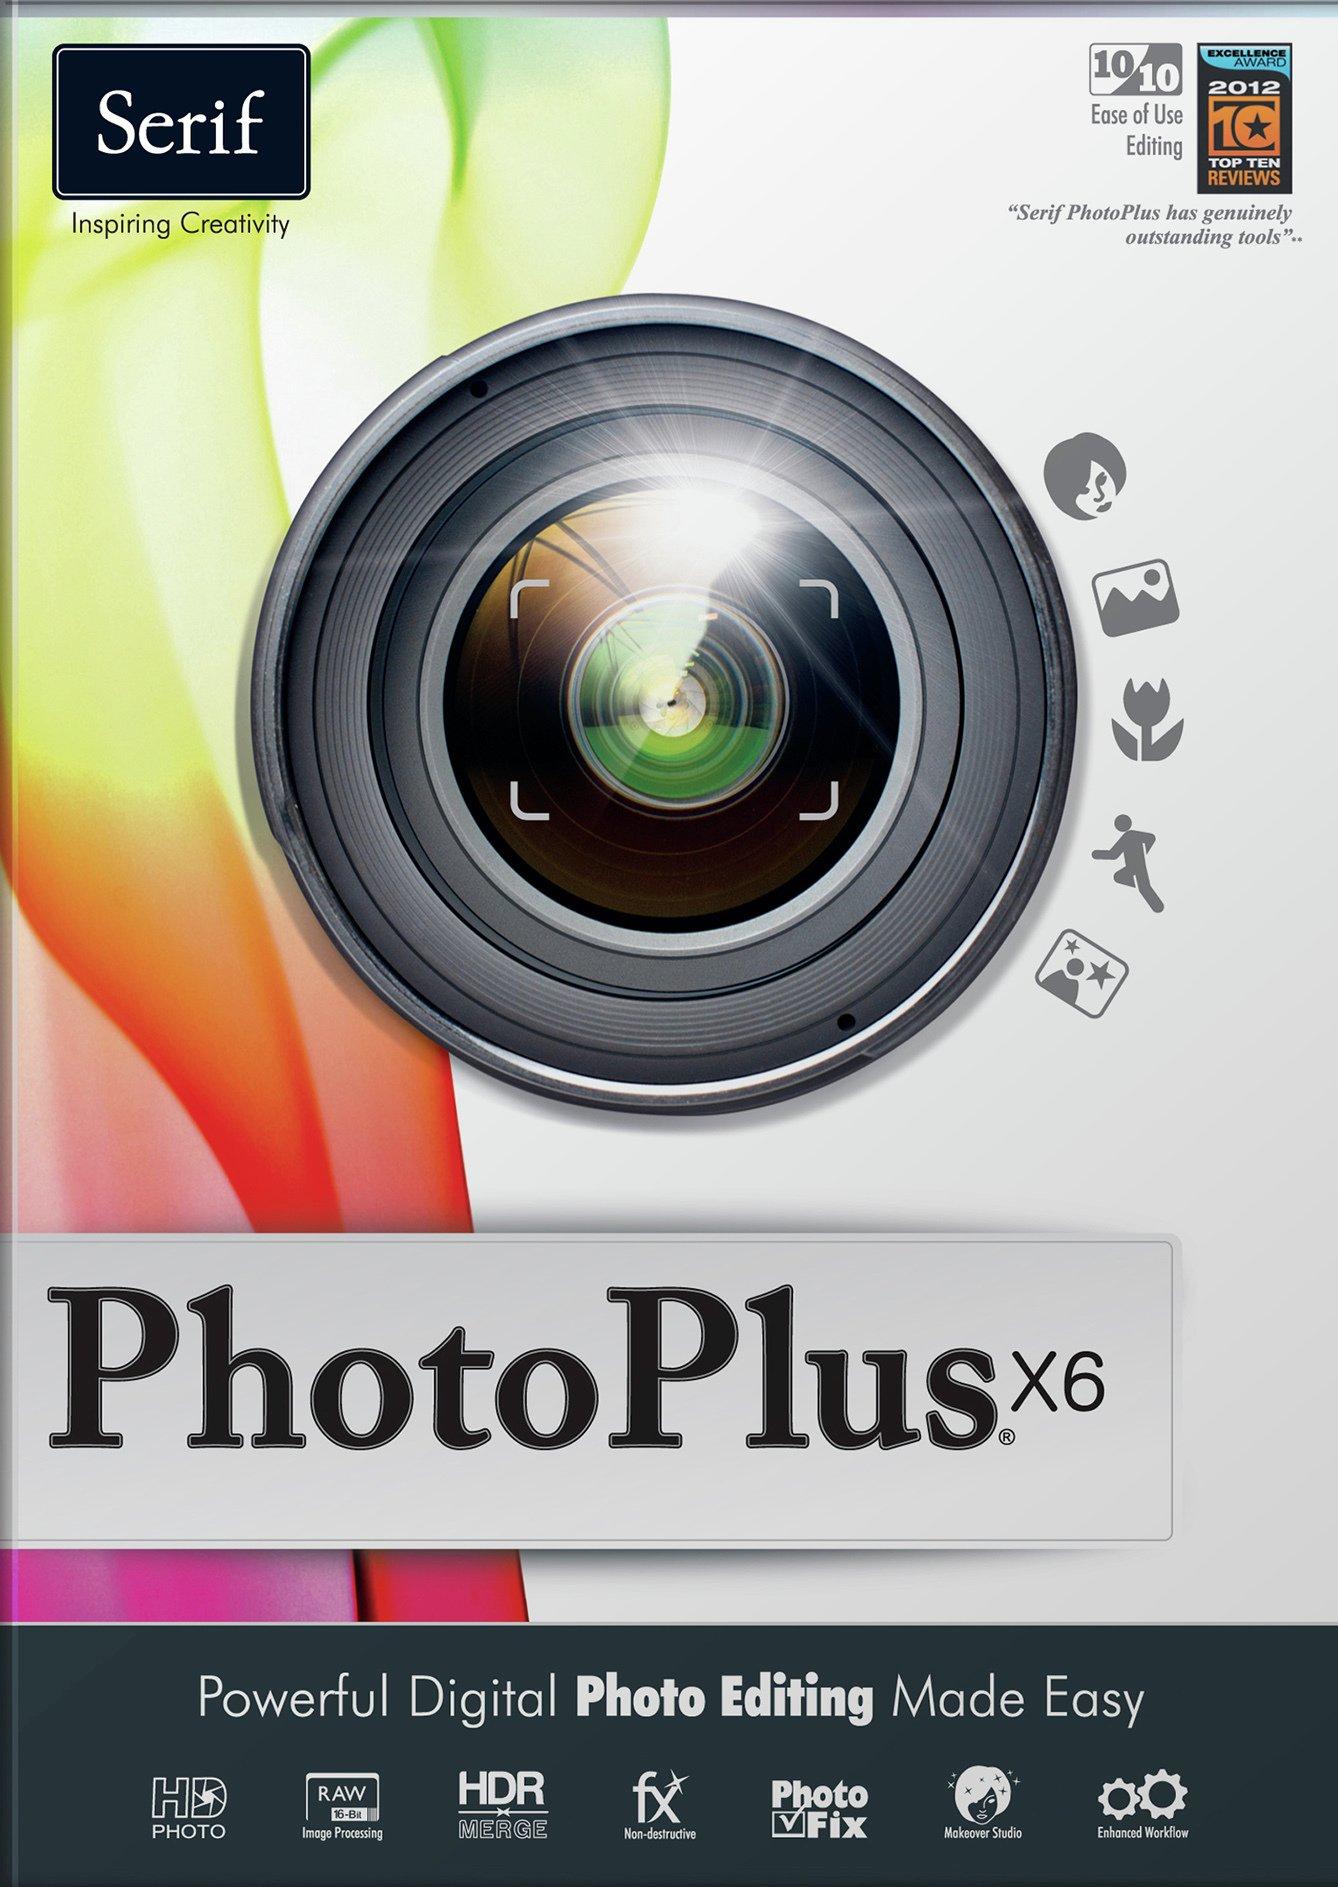 PhotoPlus X6 Photo PC Software.